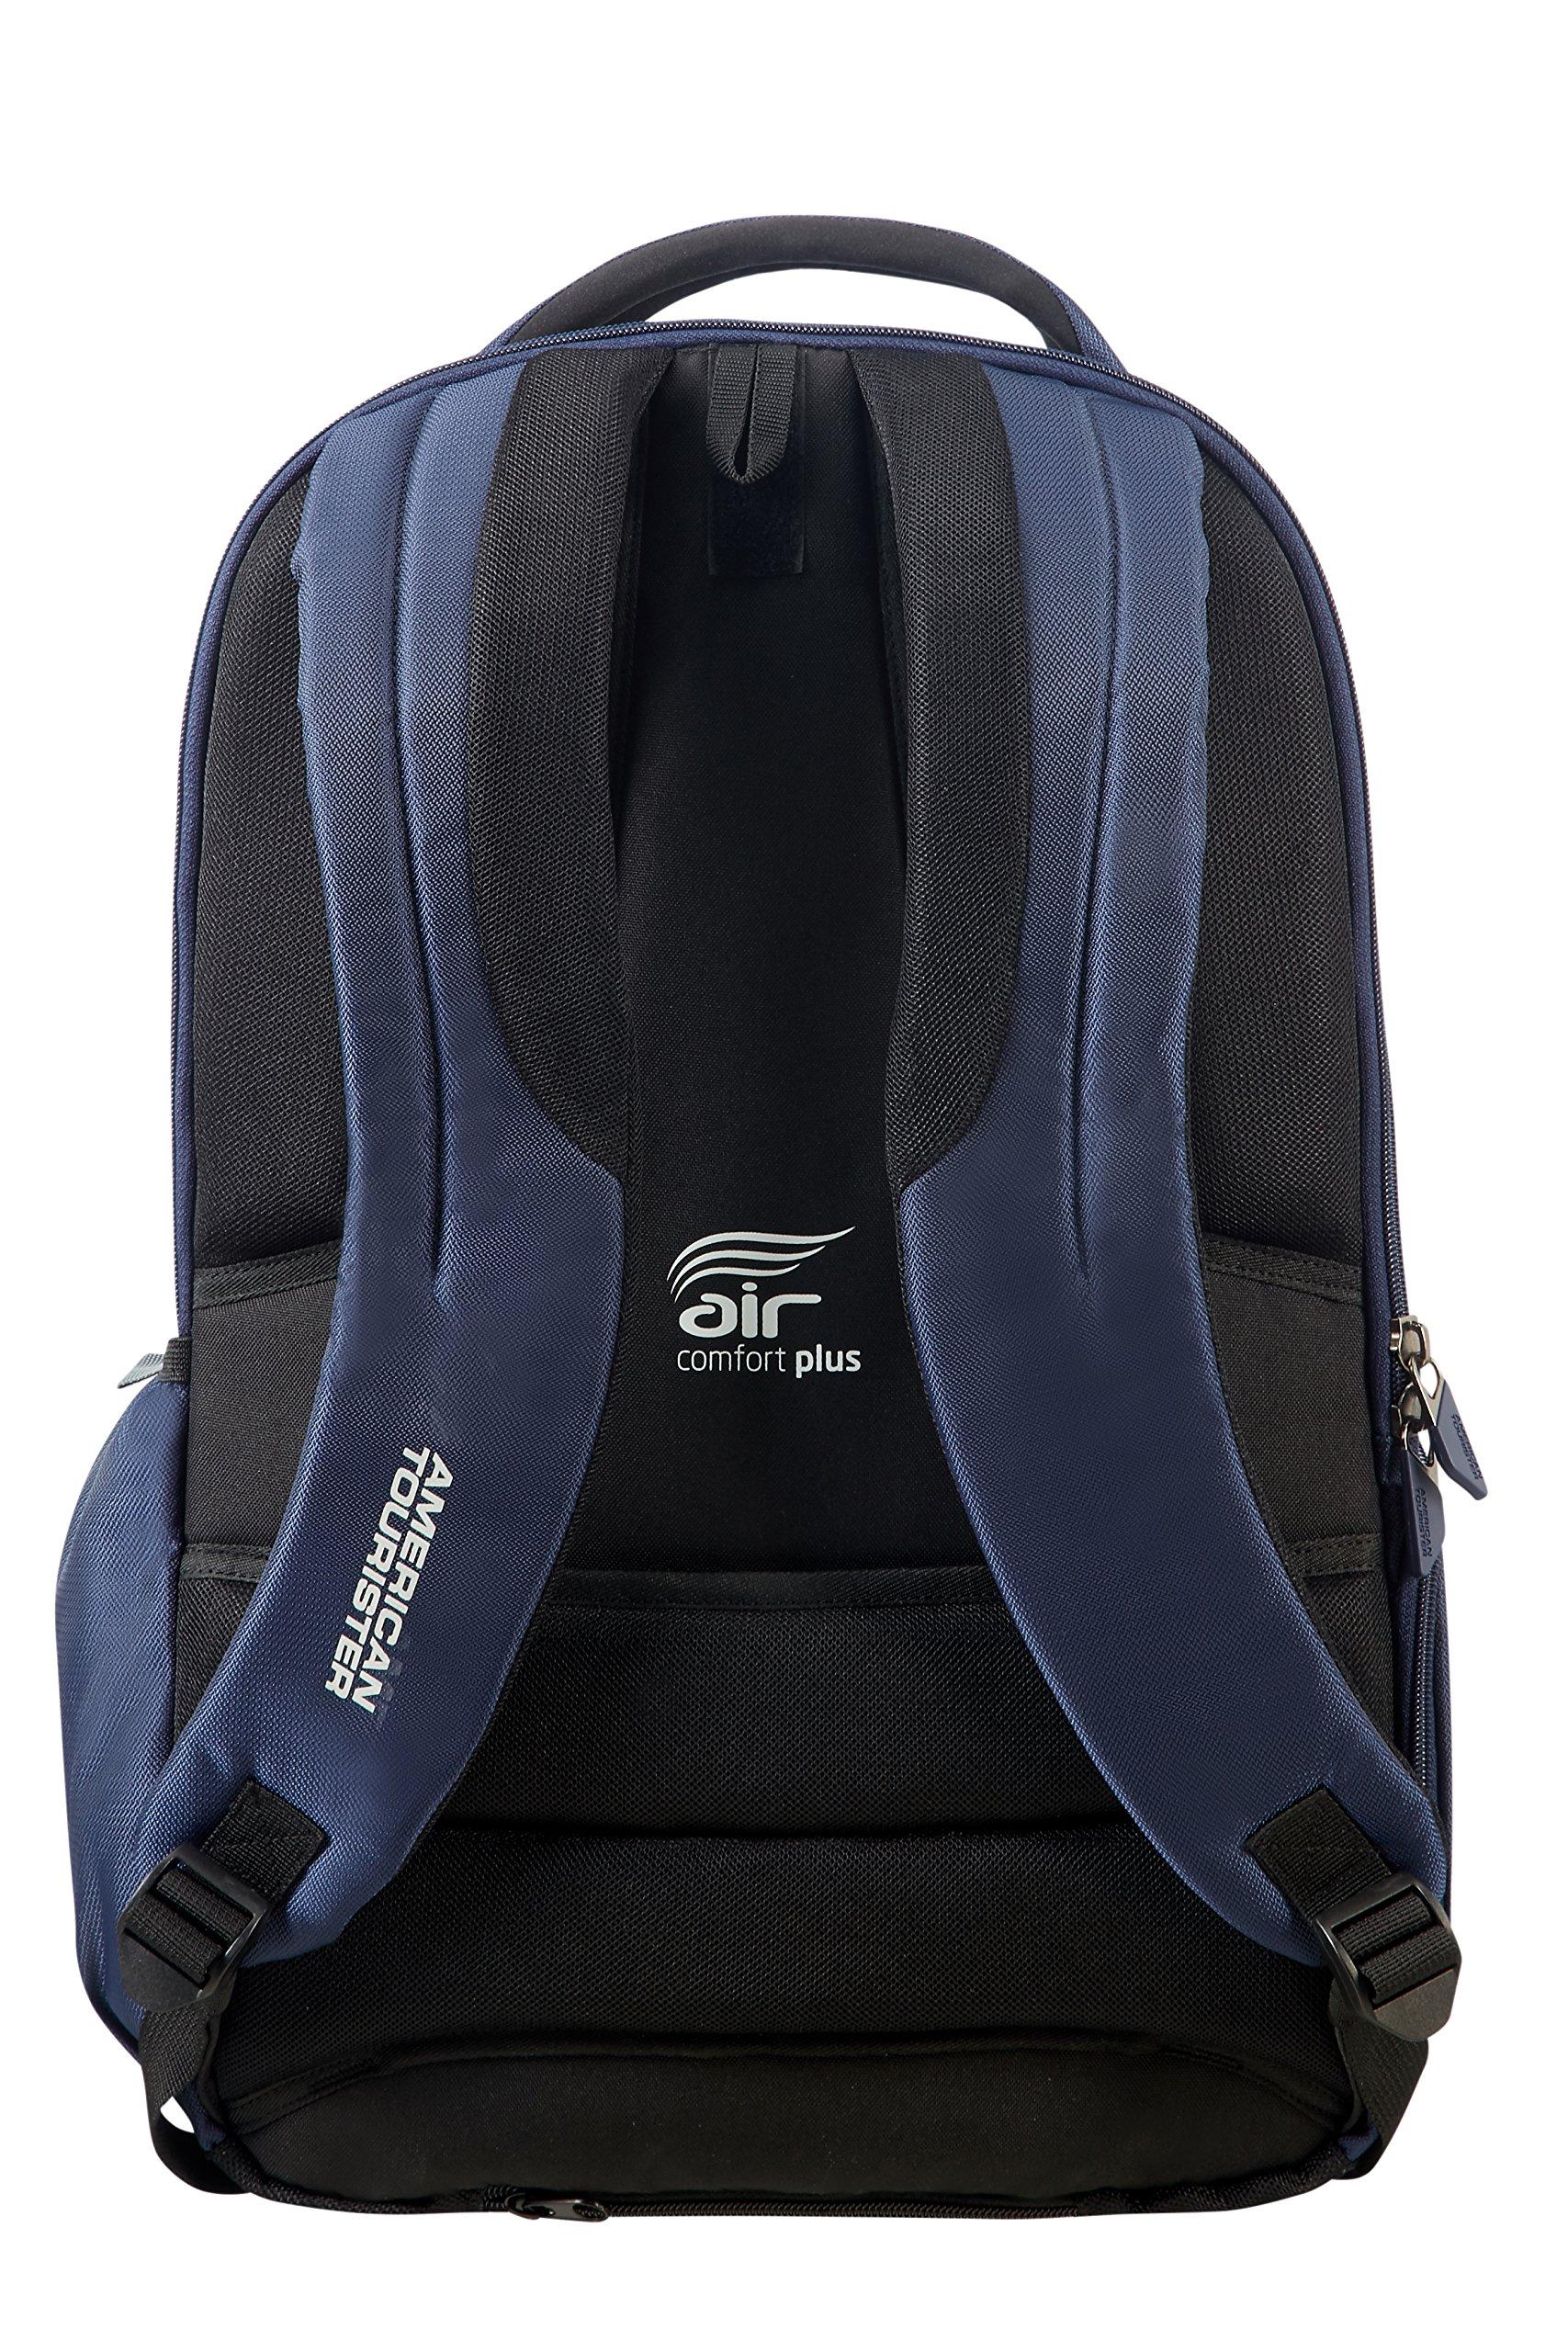 918ohKStBKL - American Tourister Urban Groove - 15.6 pulgadas Mochila para portátil, 50 cm, 27 L, Azul (Blue)